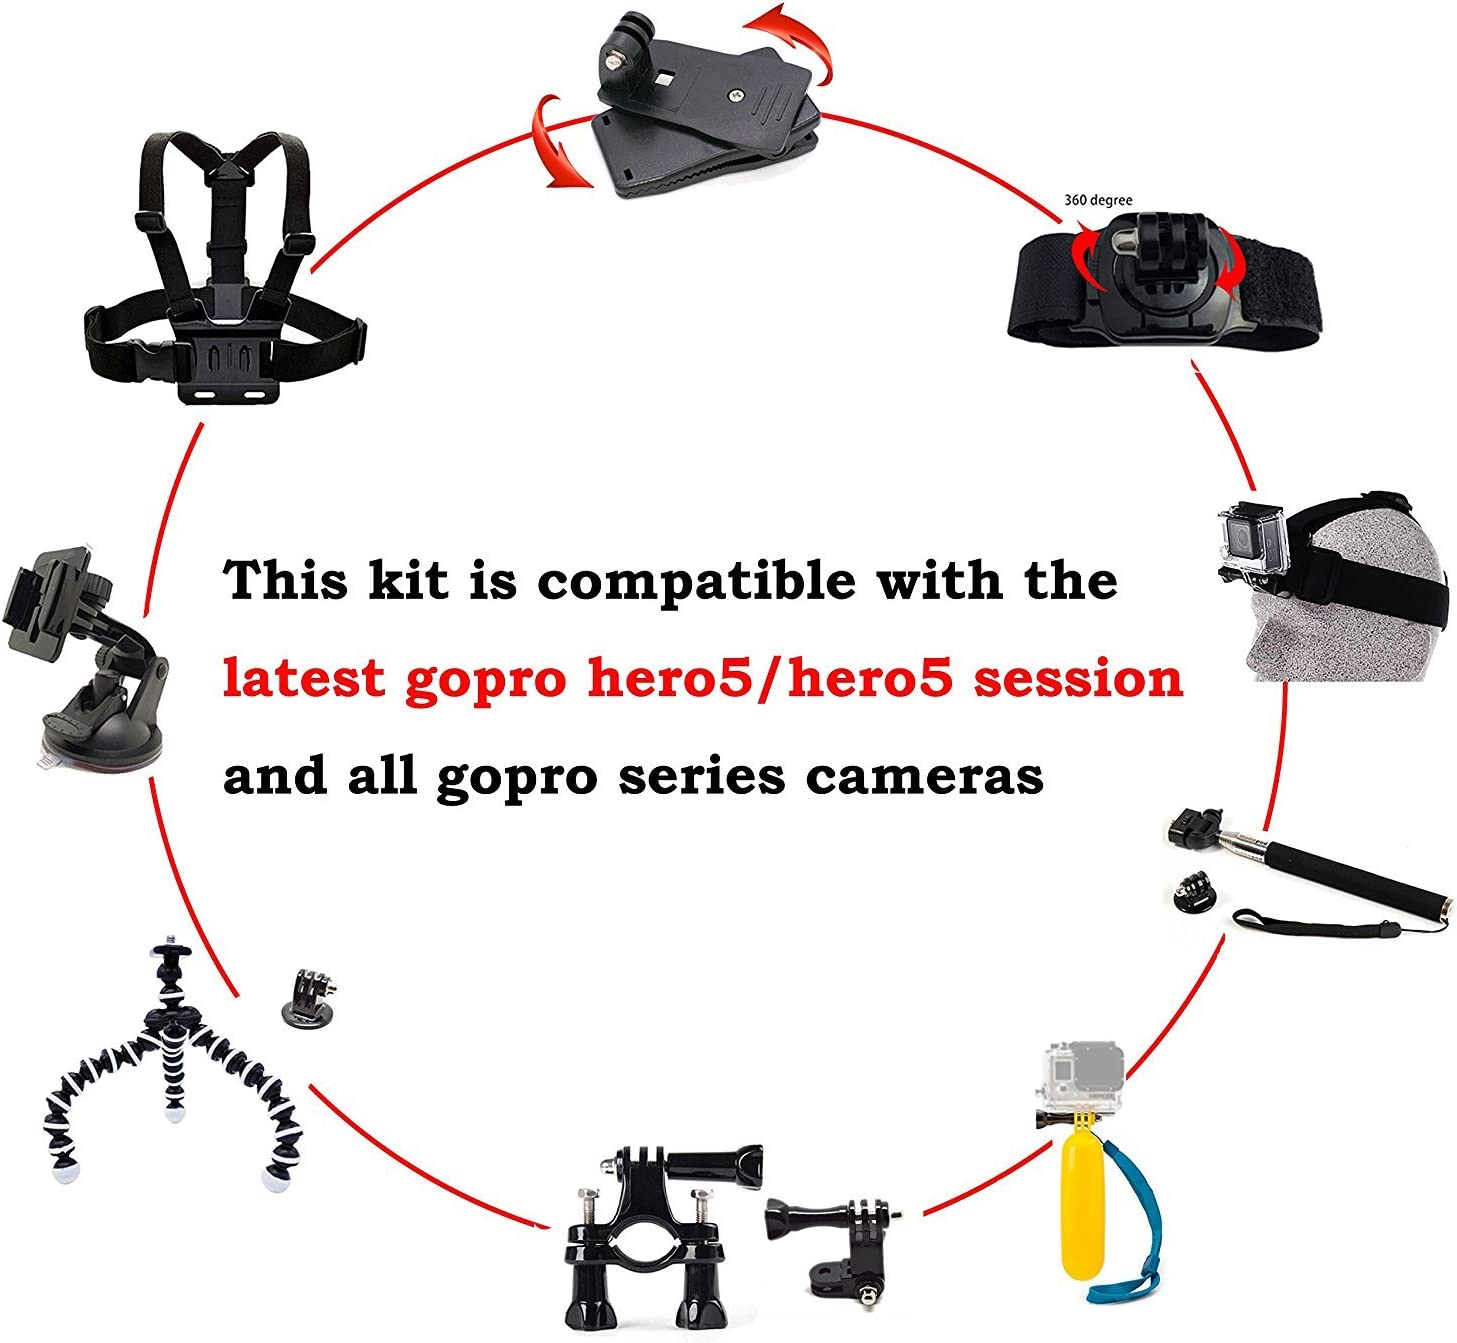 AKASO Accesories Gopro Accessories Head Strap Mount Headstrap Chest Mount for AKASO EK7000 Gopro Hero5 Gopro Session Apeman A70 Apeman Waterproof Action Camera